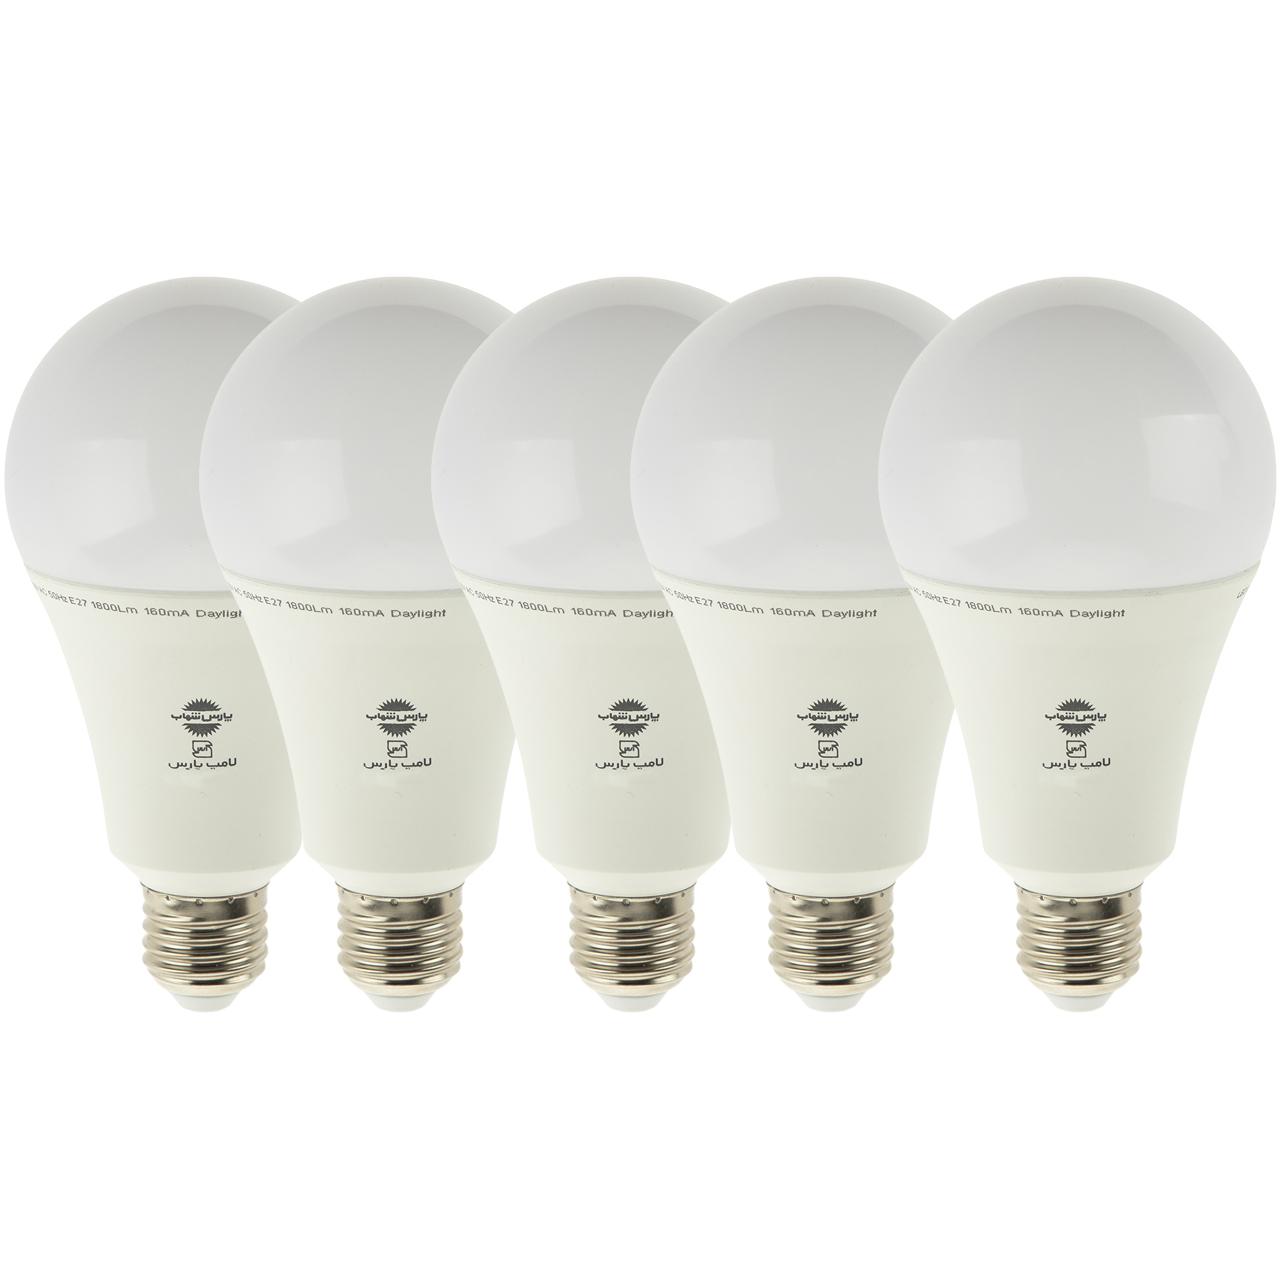 لامپ ال ای دی 20 وات پارس شهاب مدل 32975 پایه E27 بسته 5 عددی | Pars Shahab 32975 LED Lamp E27 Pack of 5